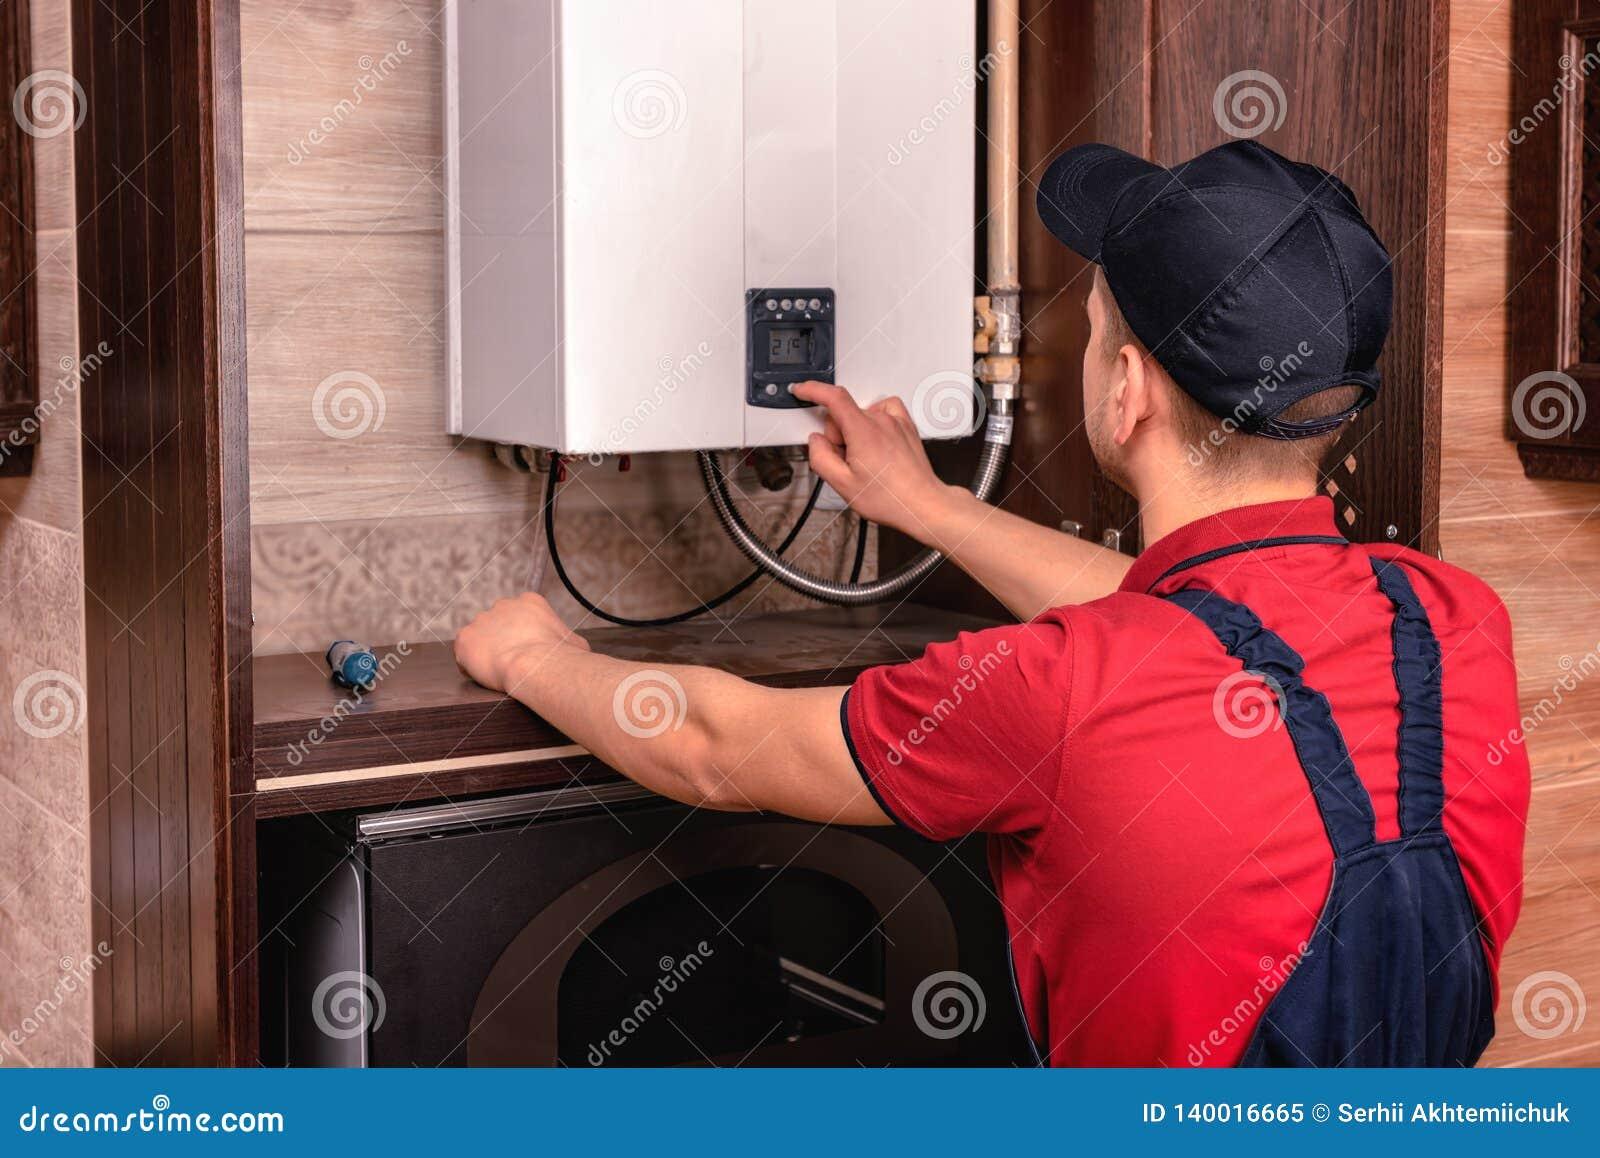 Plumber adjusts gas boiler before operating